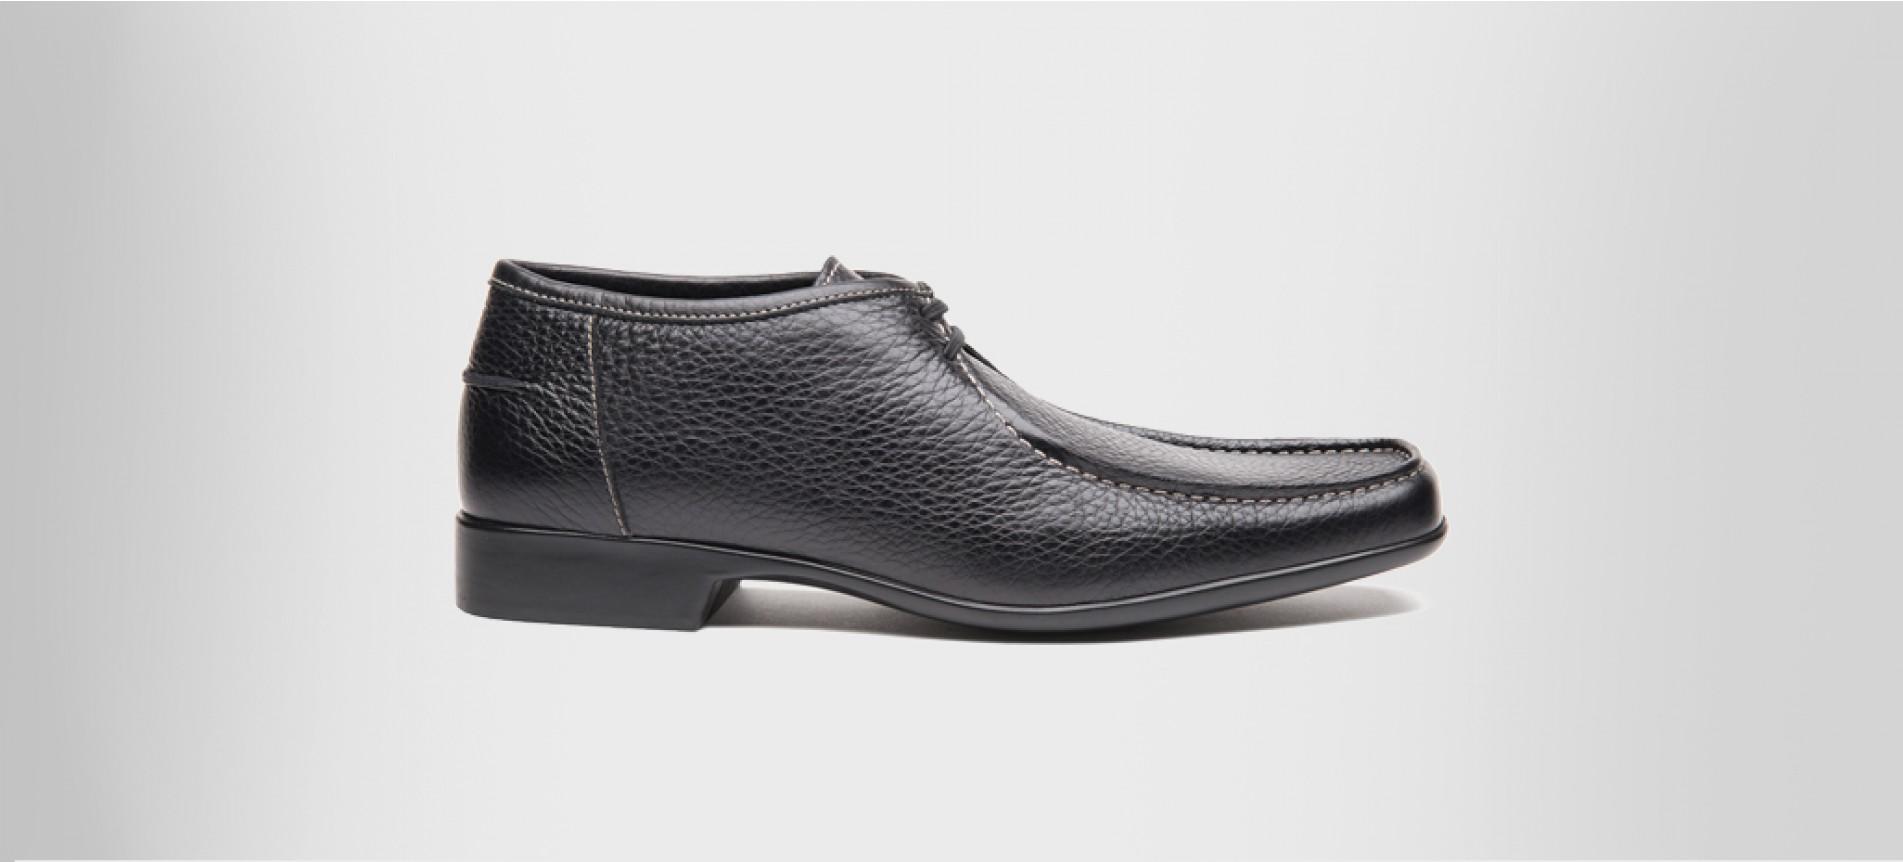 rubber sole dress boots